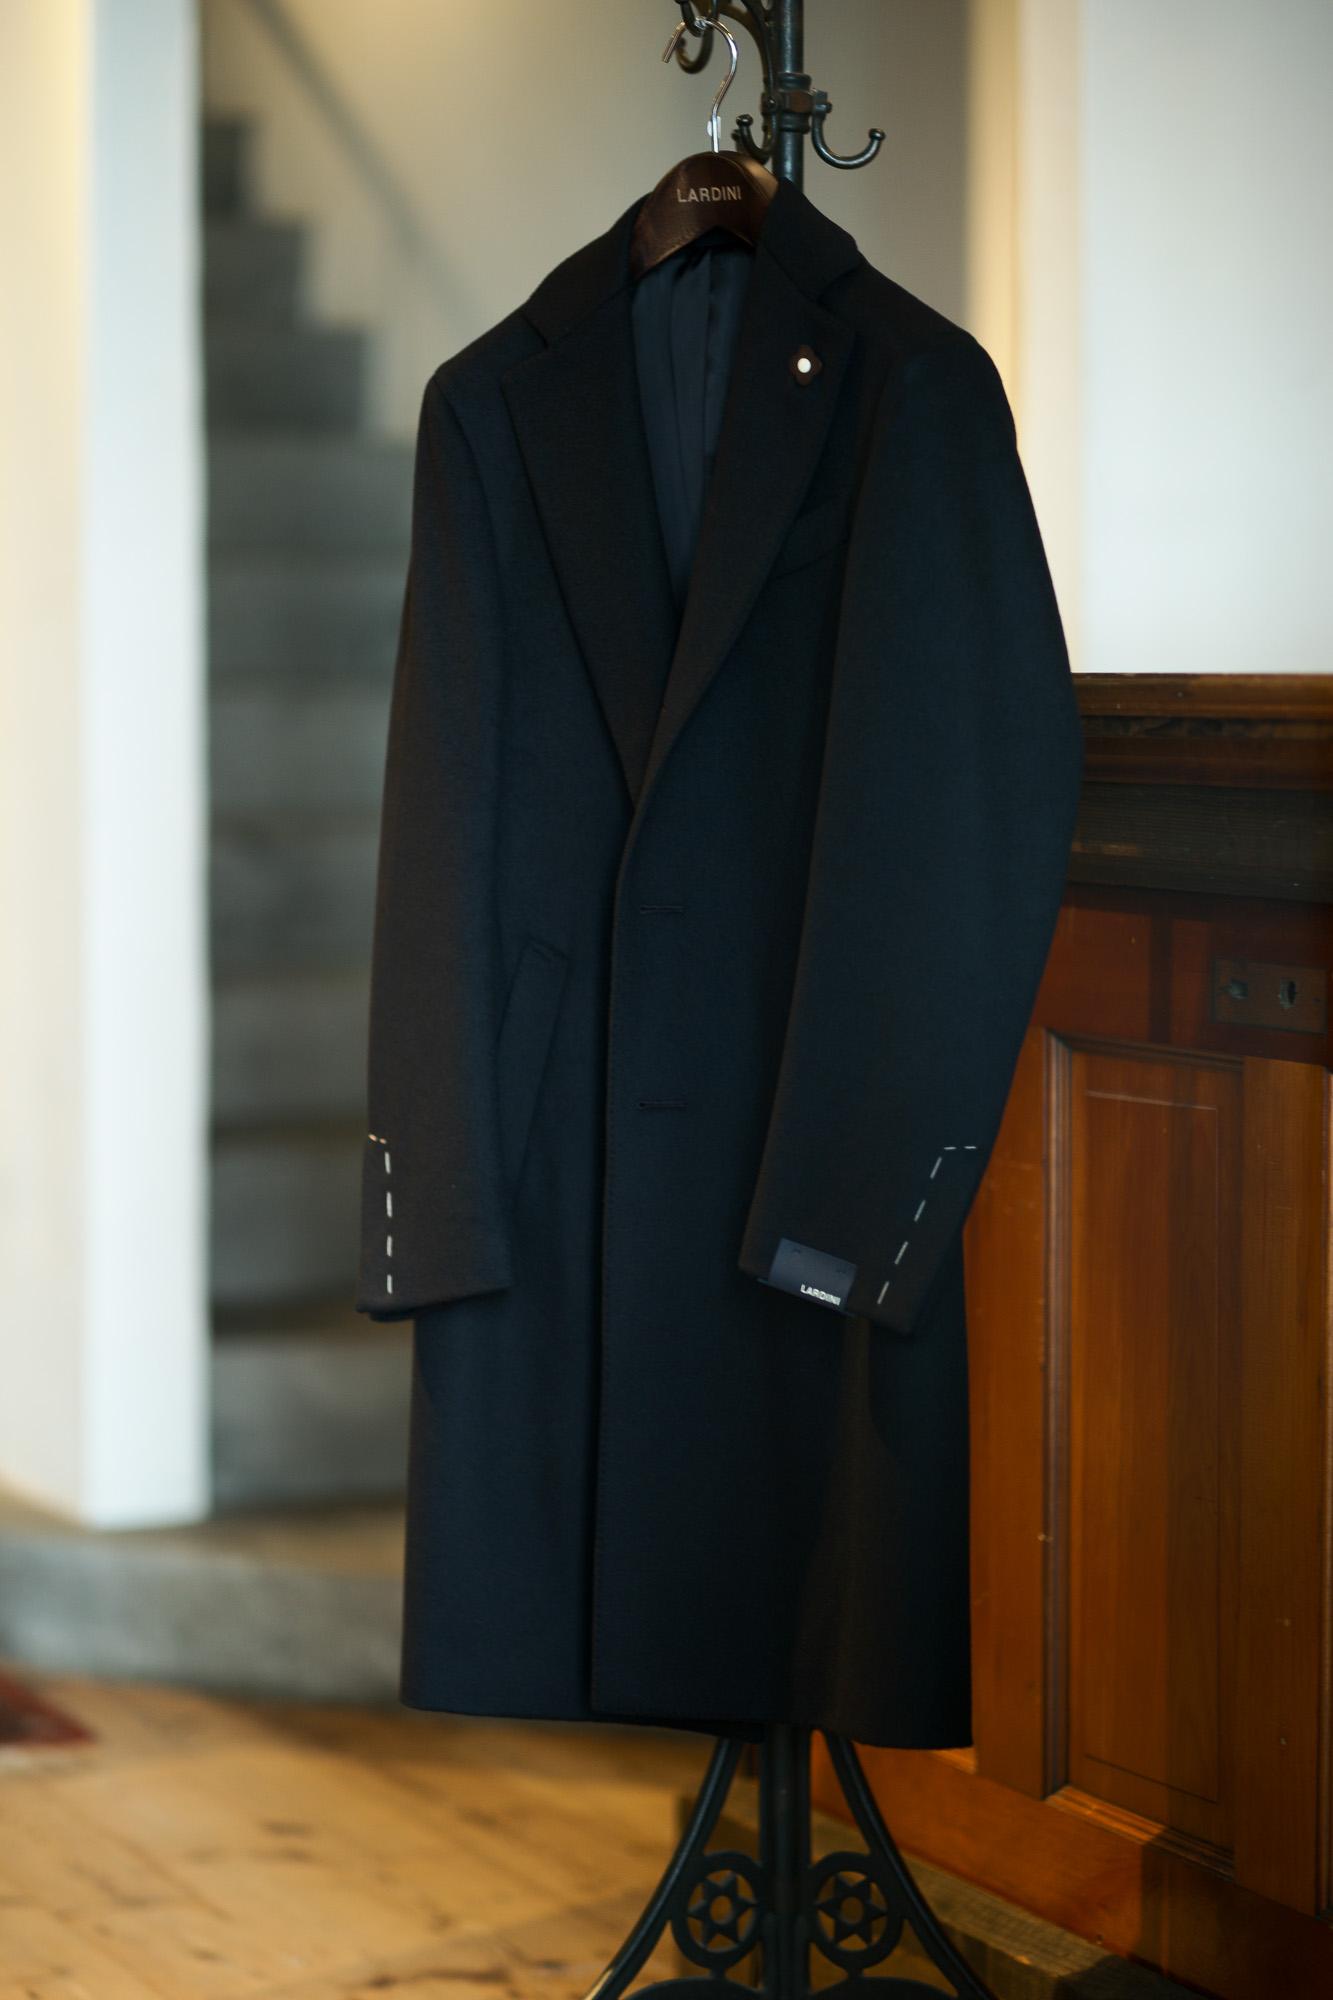 LARDINI (ラルディーニ) Spolverino Chester coat (スポルベリーノ チェスターコート) フラノウール生地 シングル チェスターコート BLACK (ブラック・4) Made in italy (イタリア製) 2019 秋冬新作 【入荷しました】【フリー分発売開始】 愛知 名古屋 Altoediritto アルトエデリット コート ロングコート